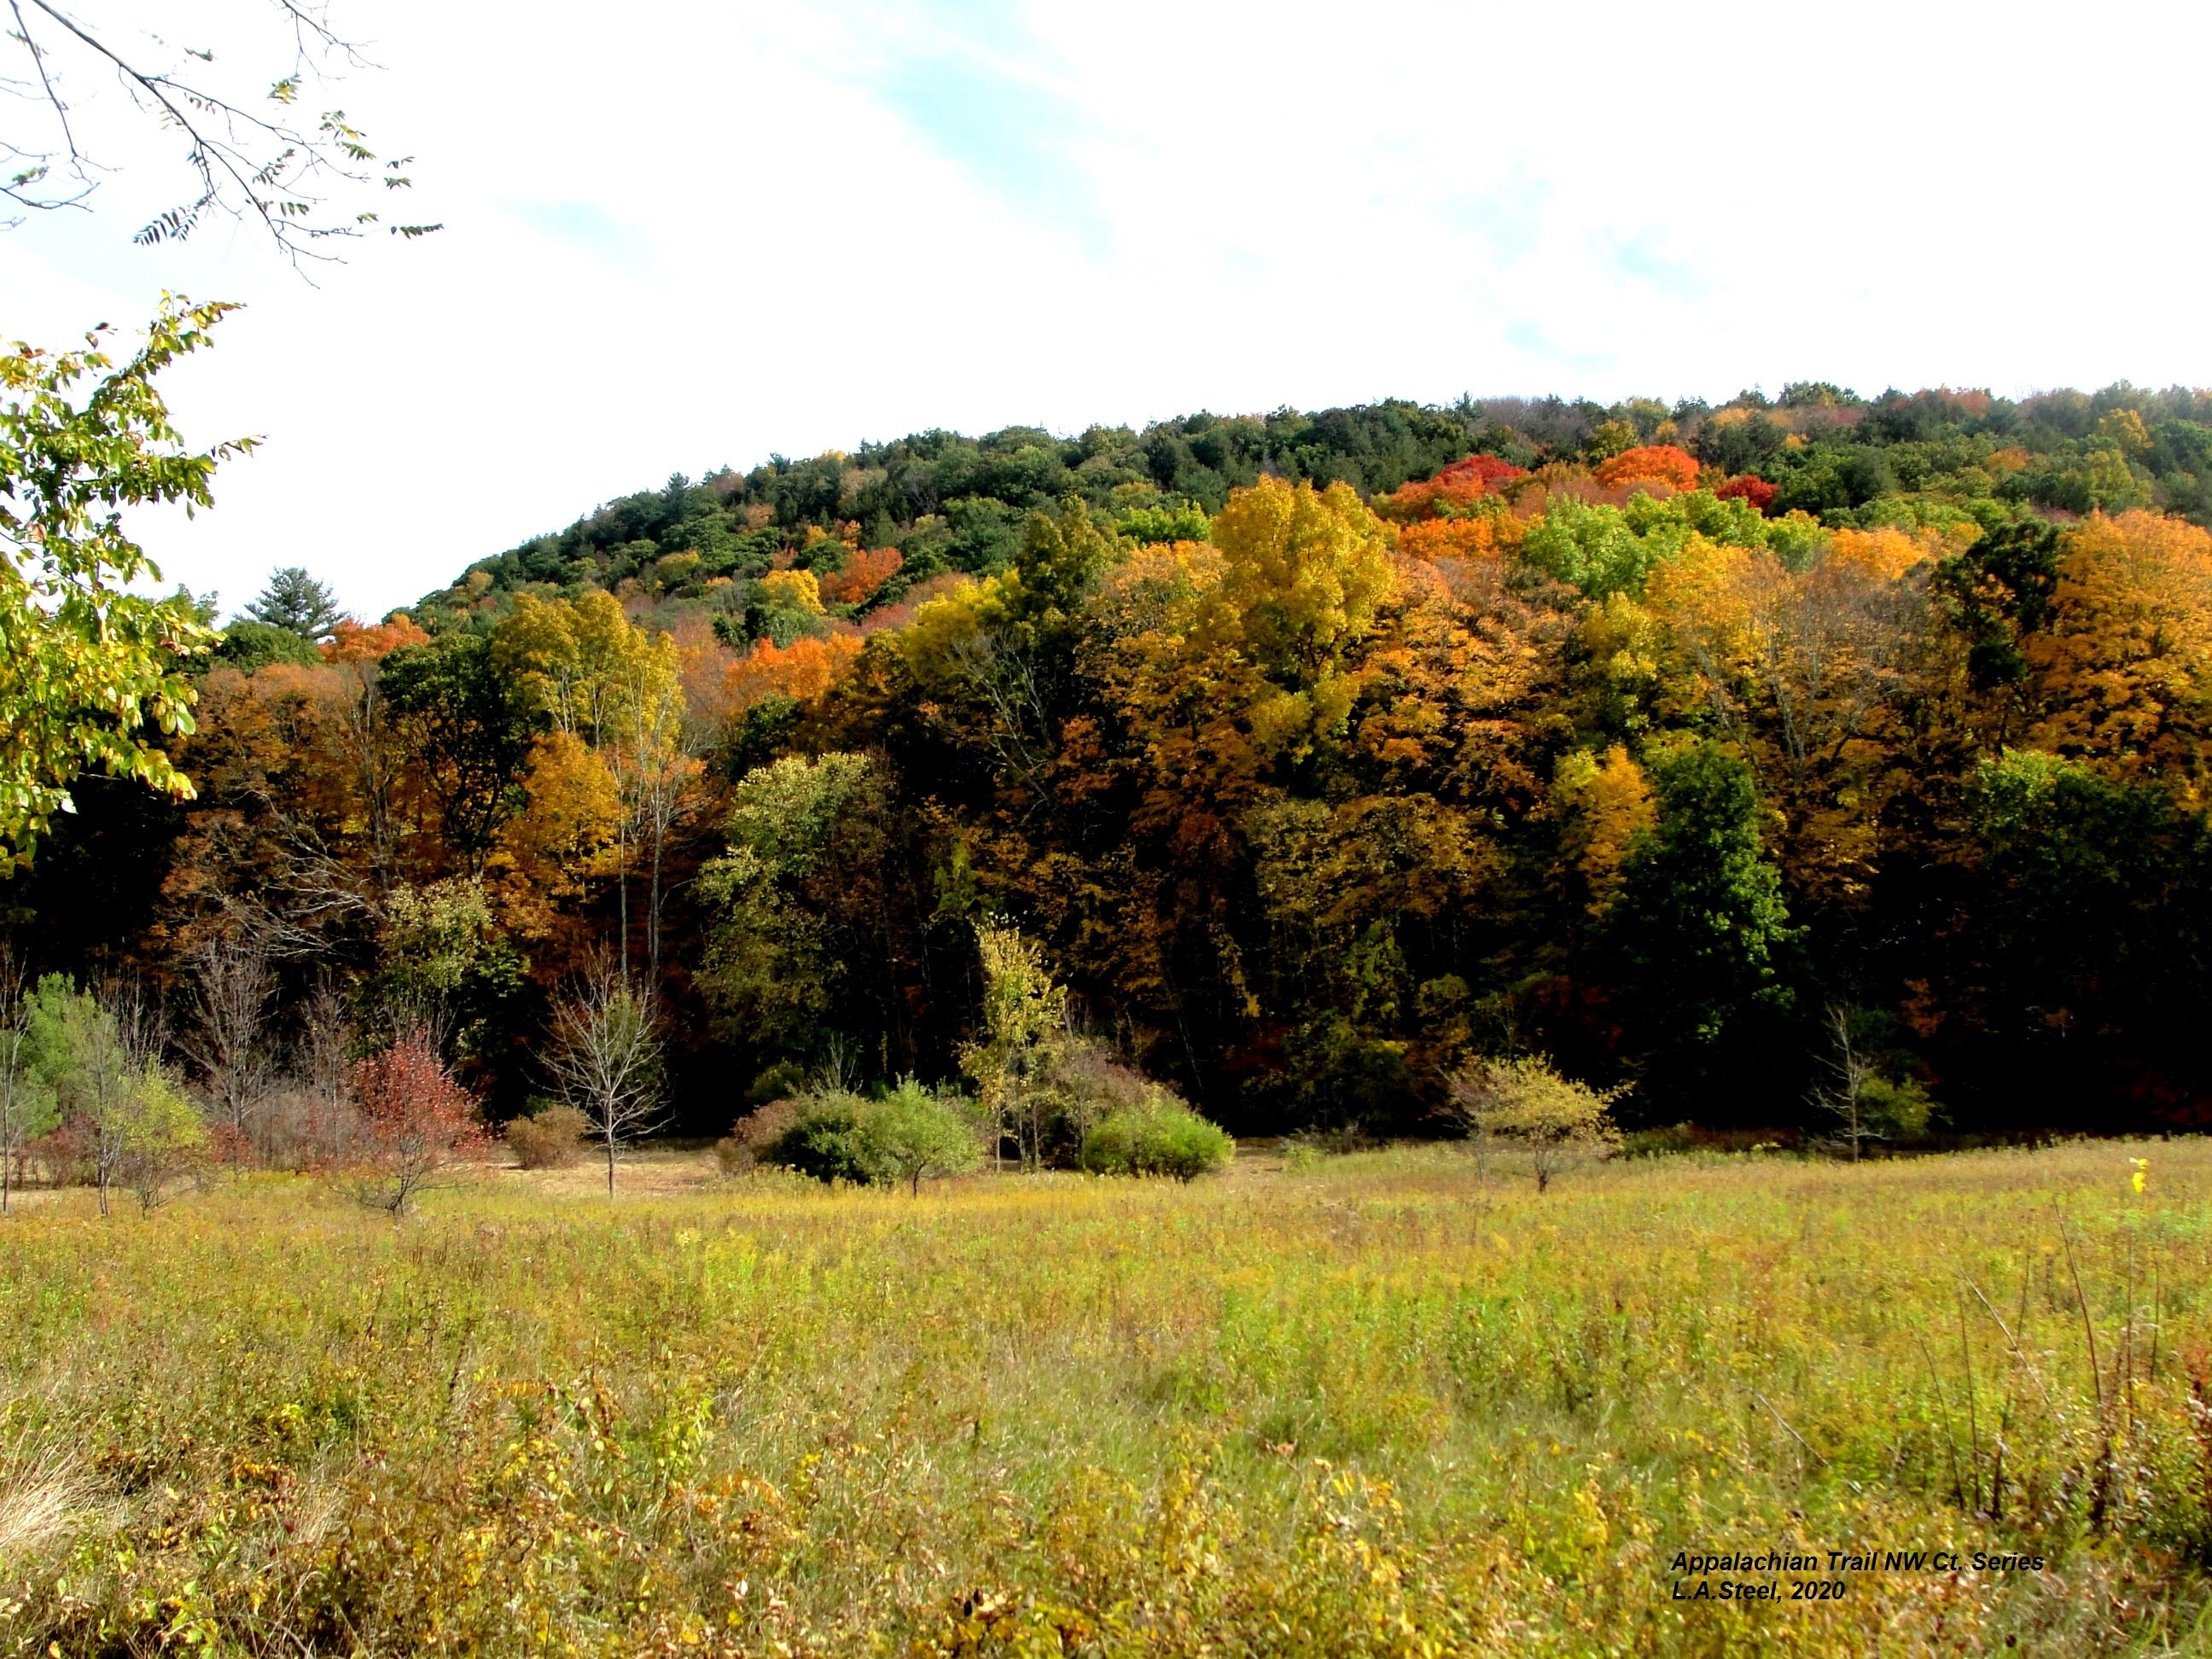 appalachian trail nw ct series 10 2020